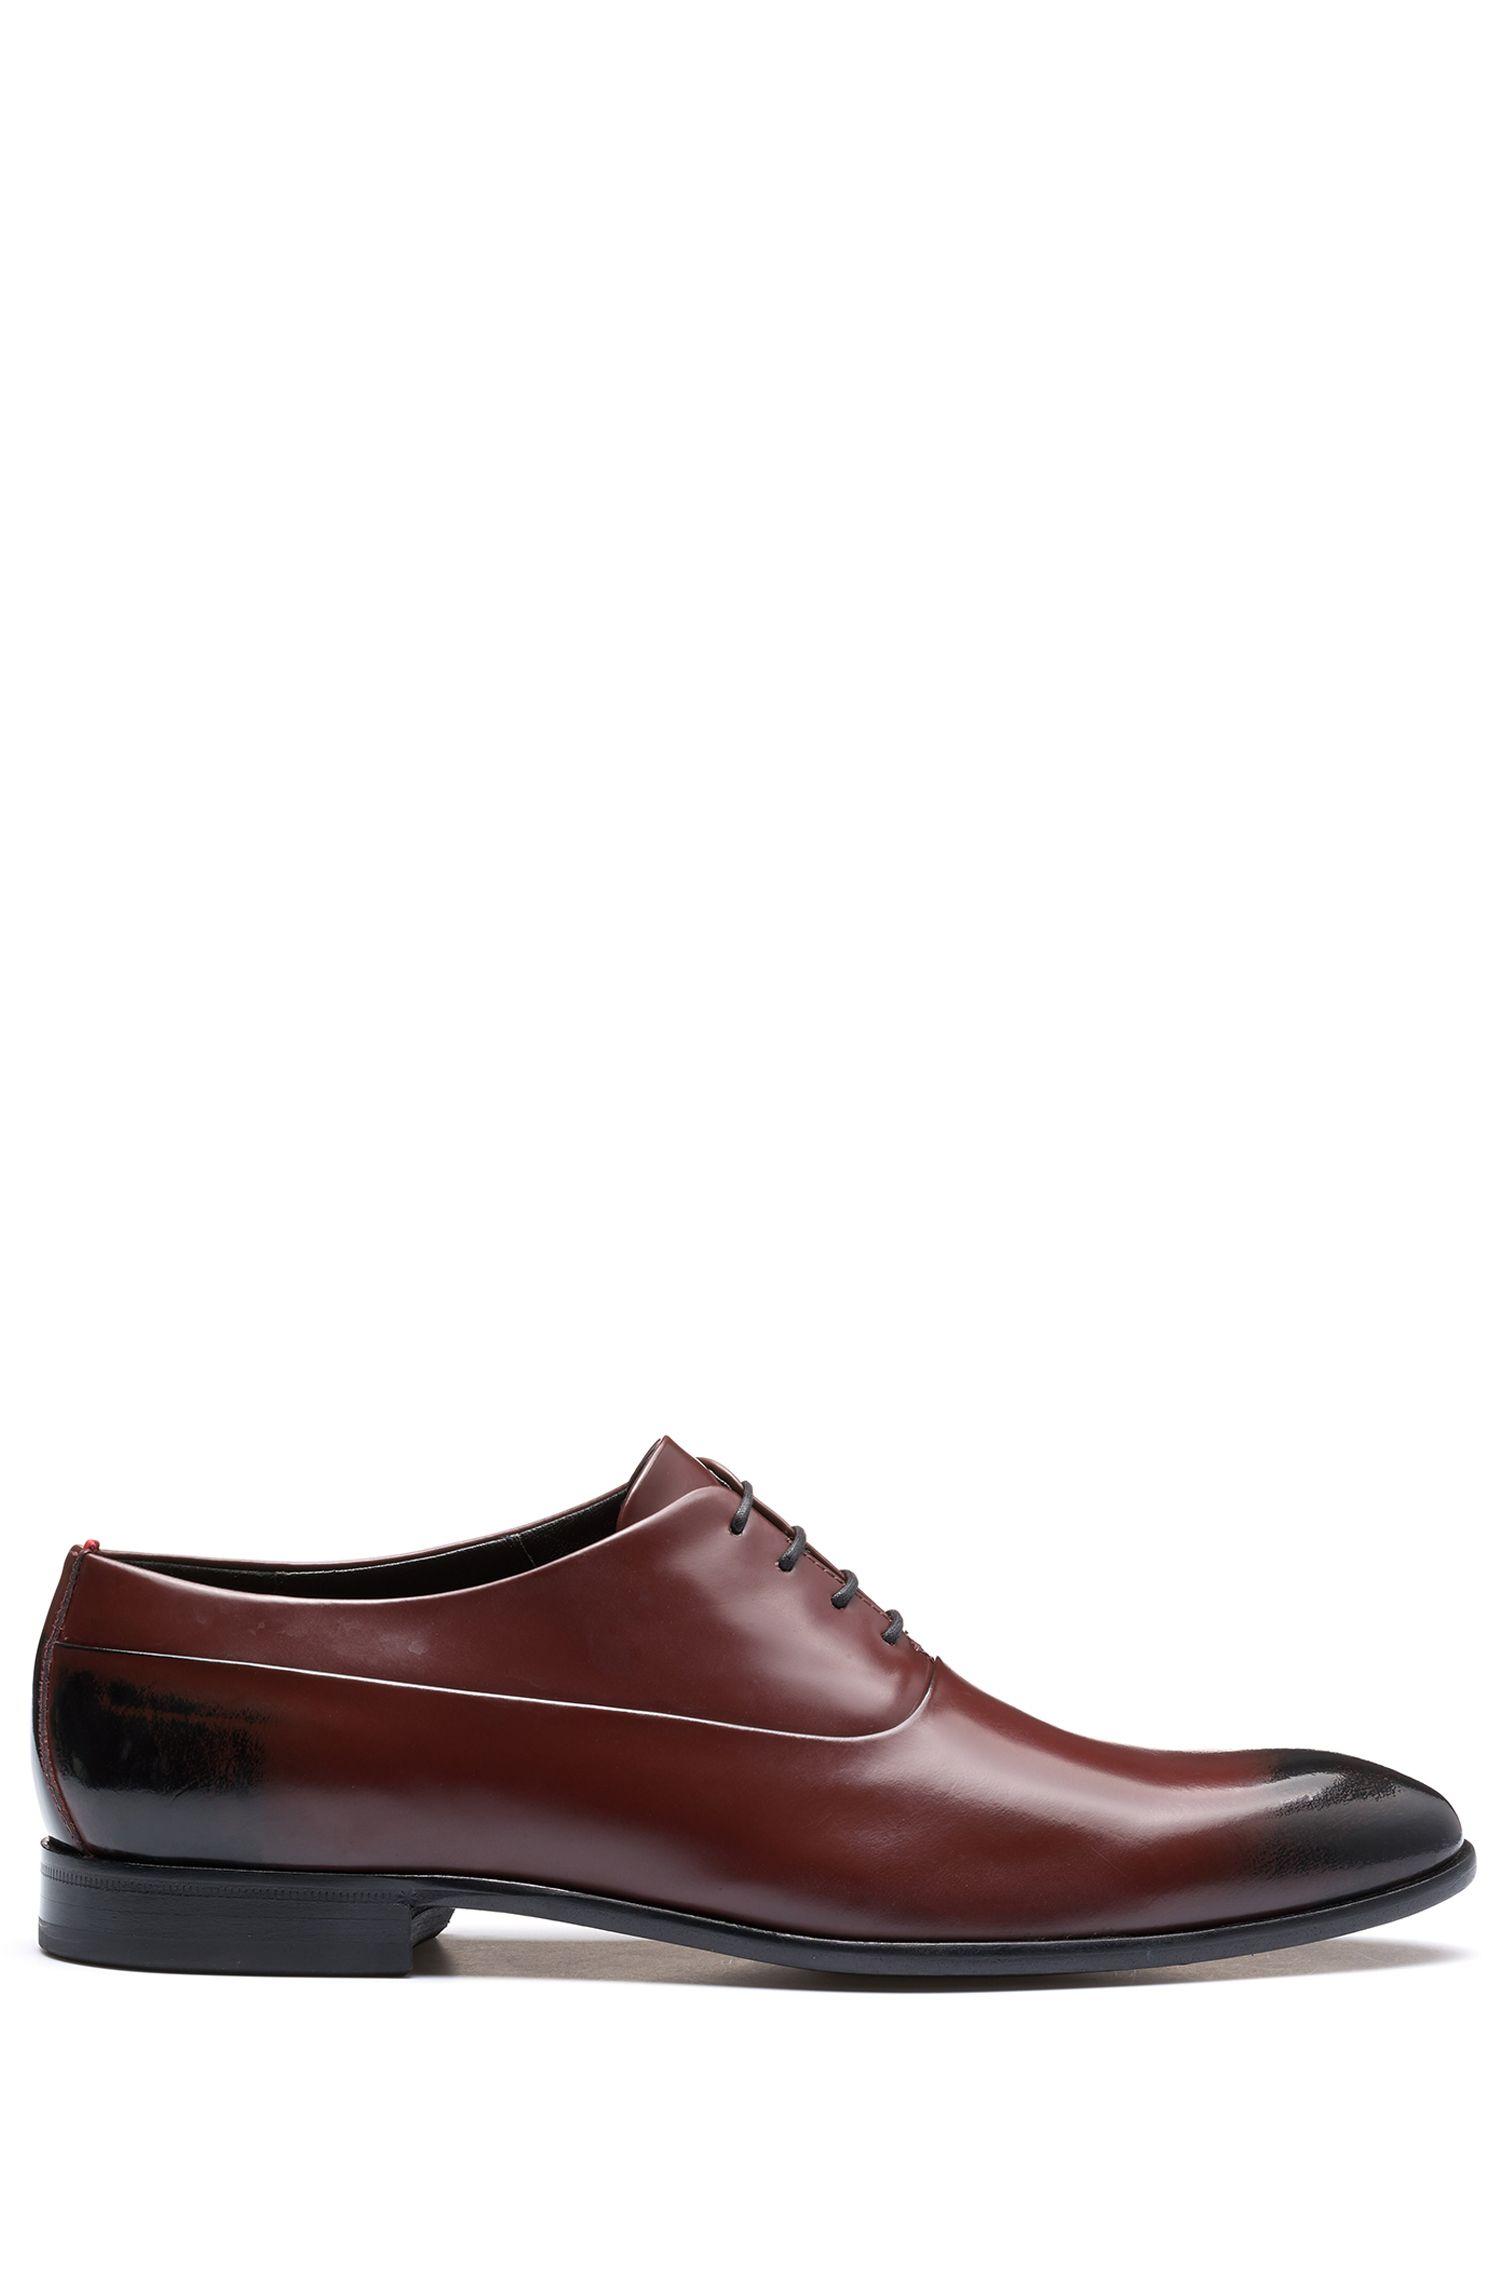 Leather Oxford Dress Shoe | Appeal Oxfr Bo